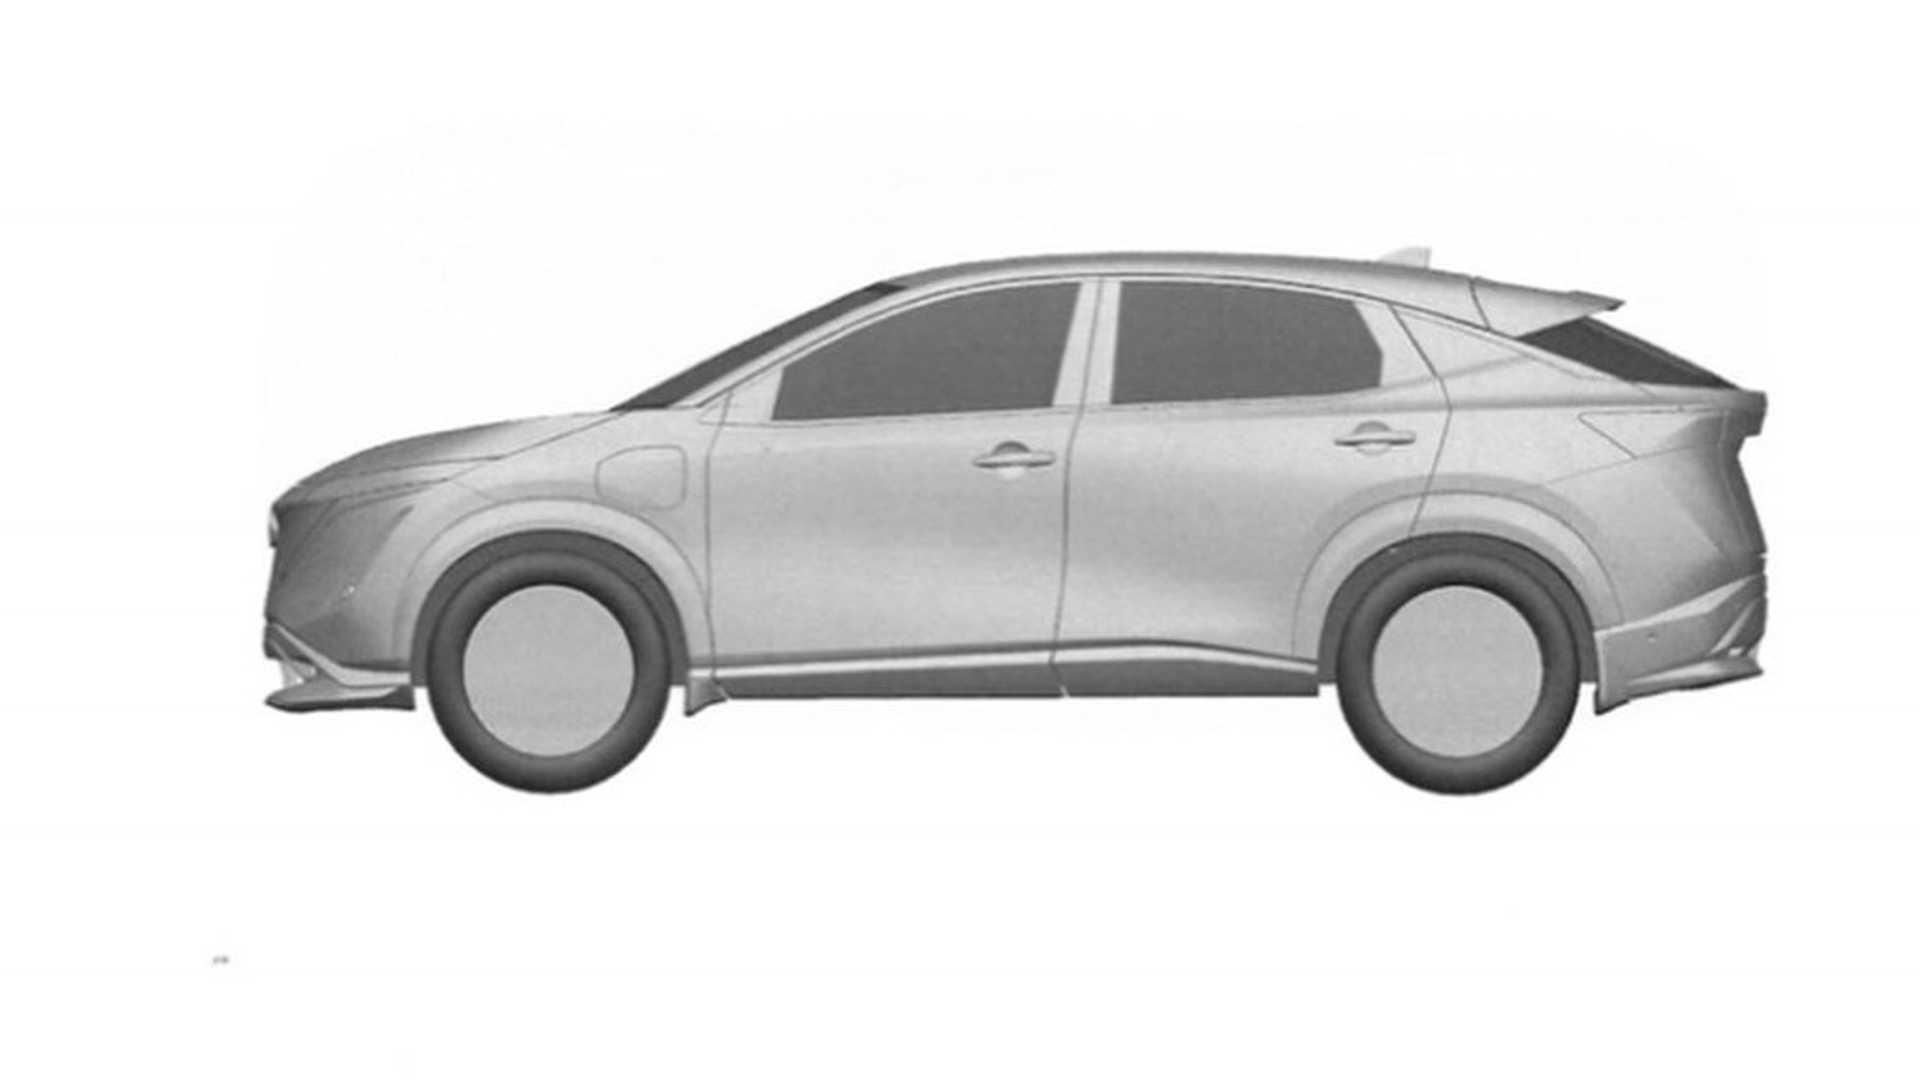 Nissan_Ariya_sketch_patent_0001